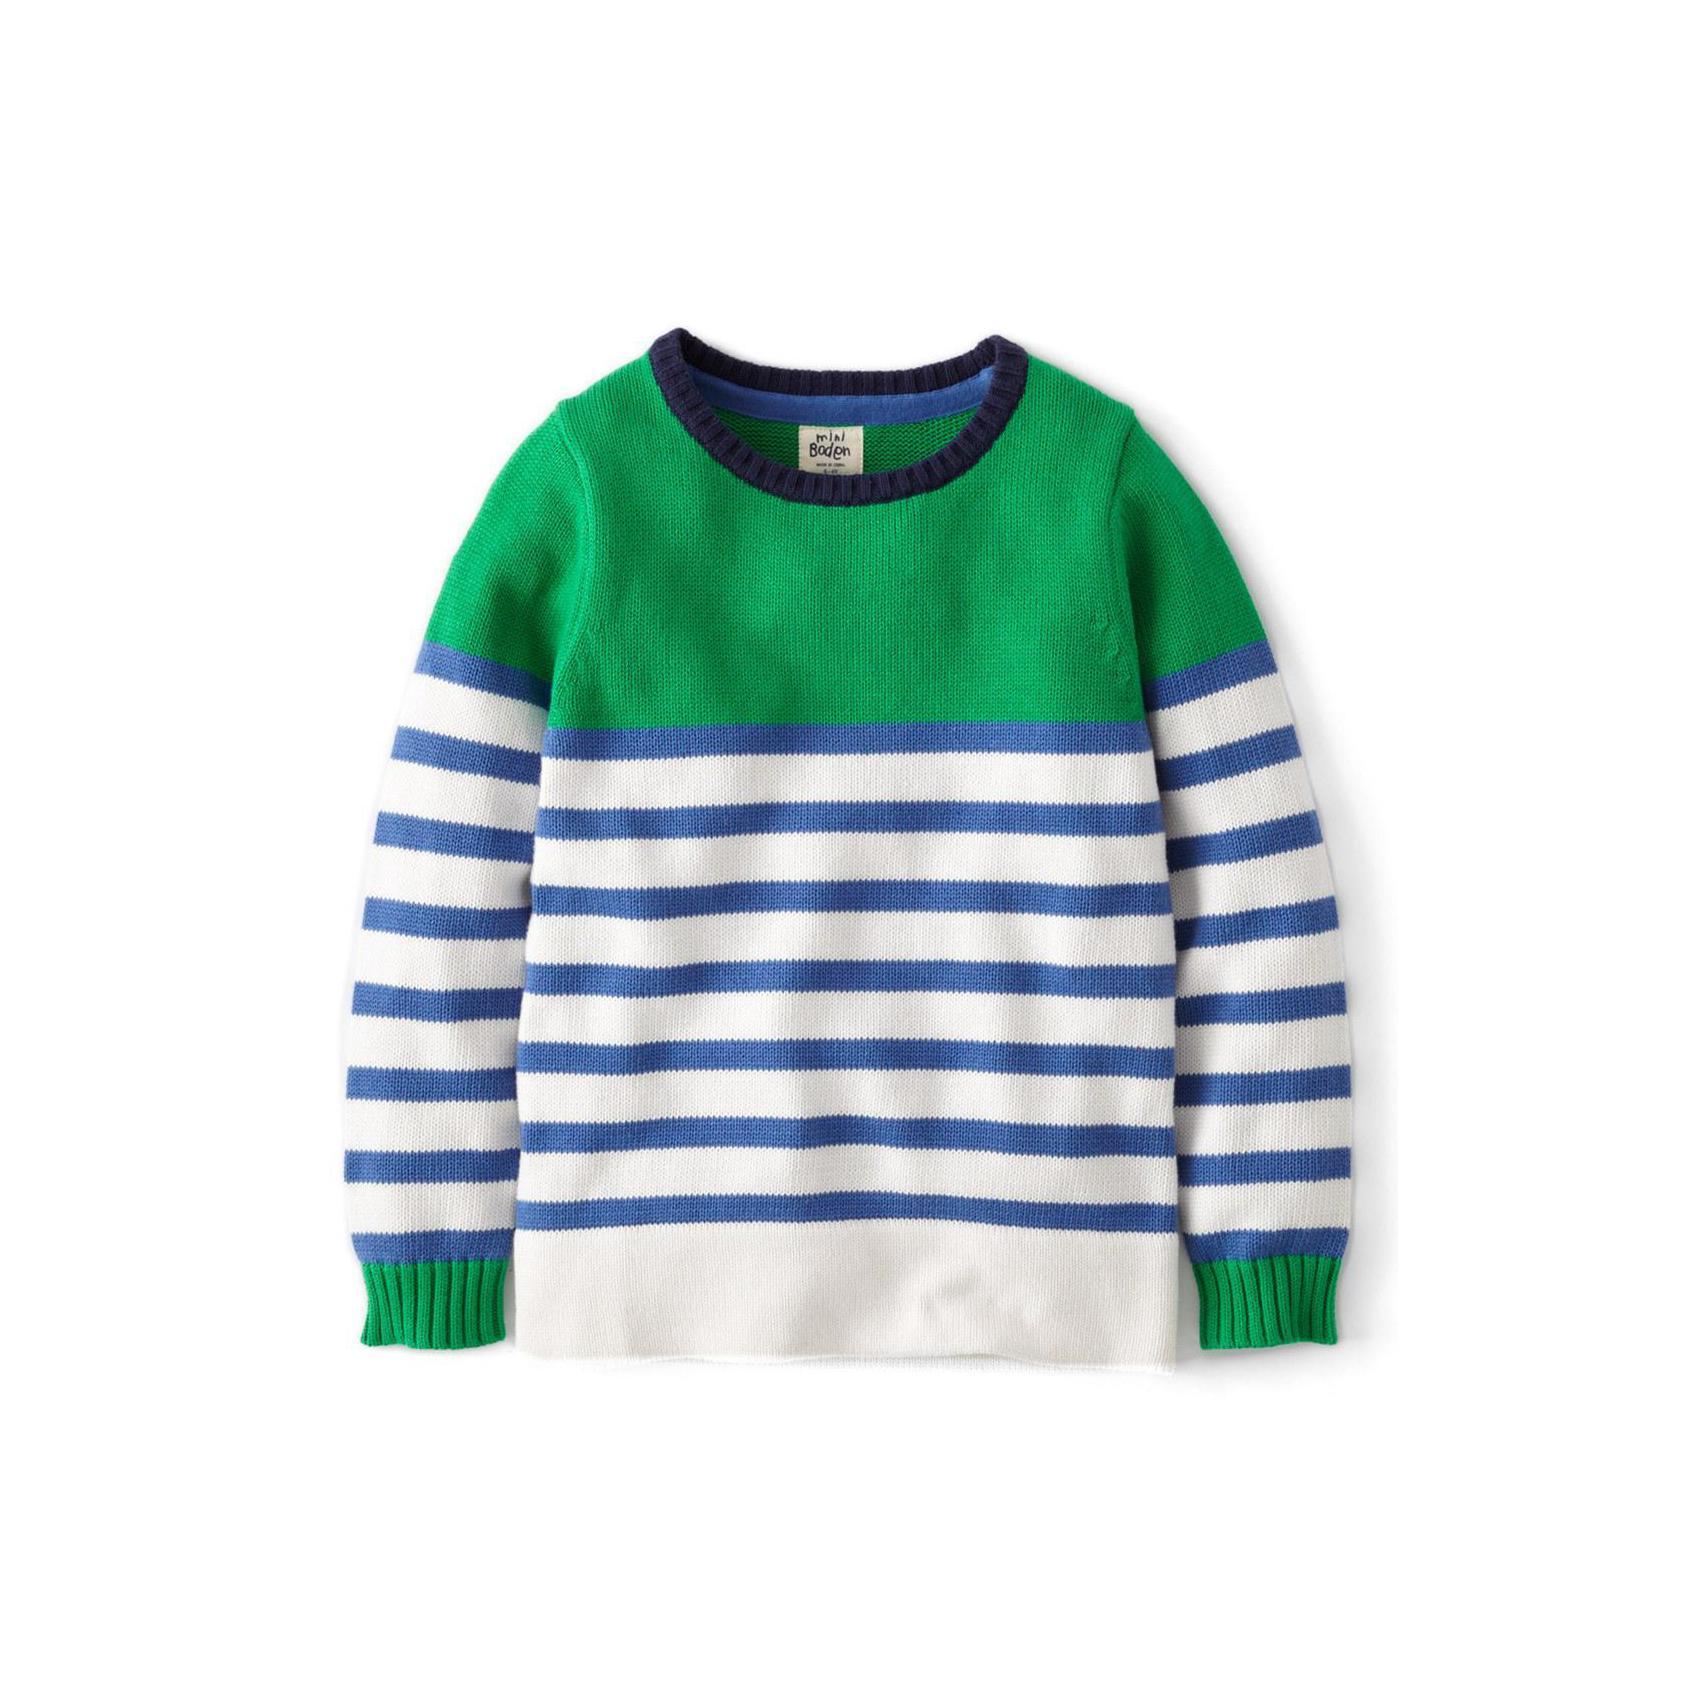 Shrinking Toddler Sweater